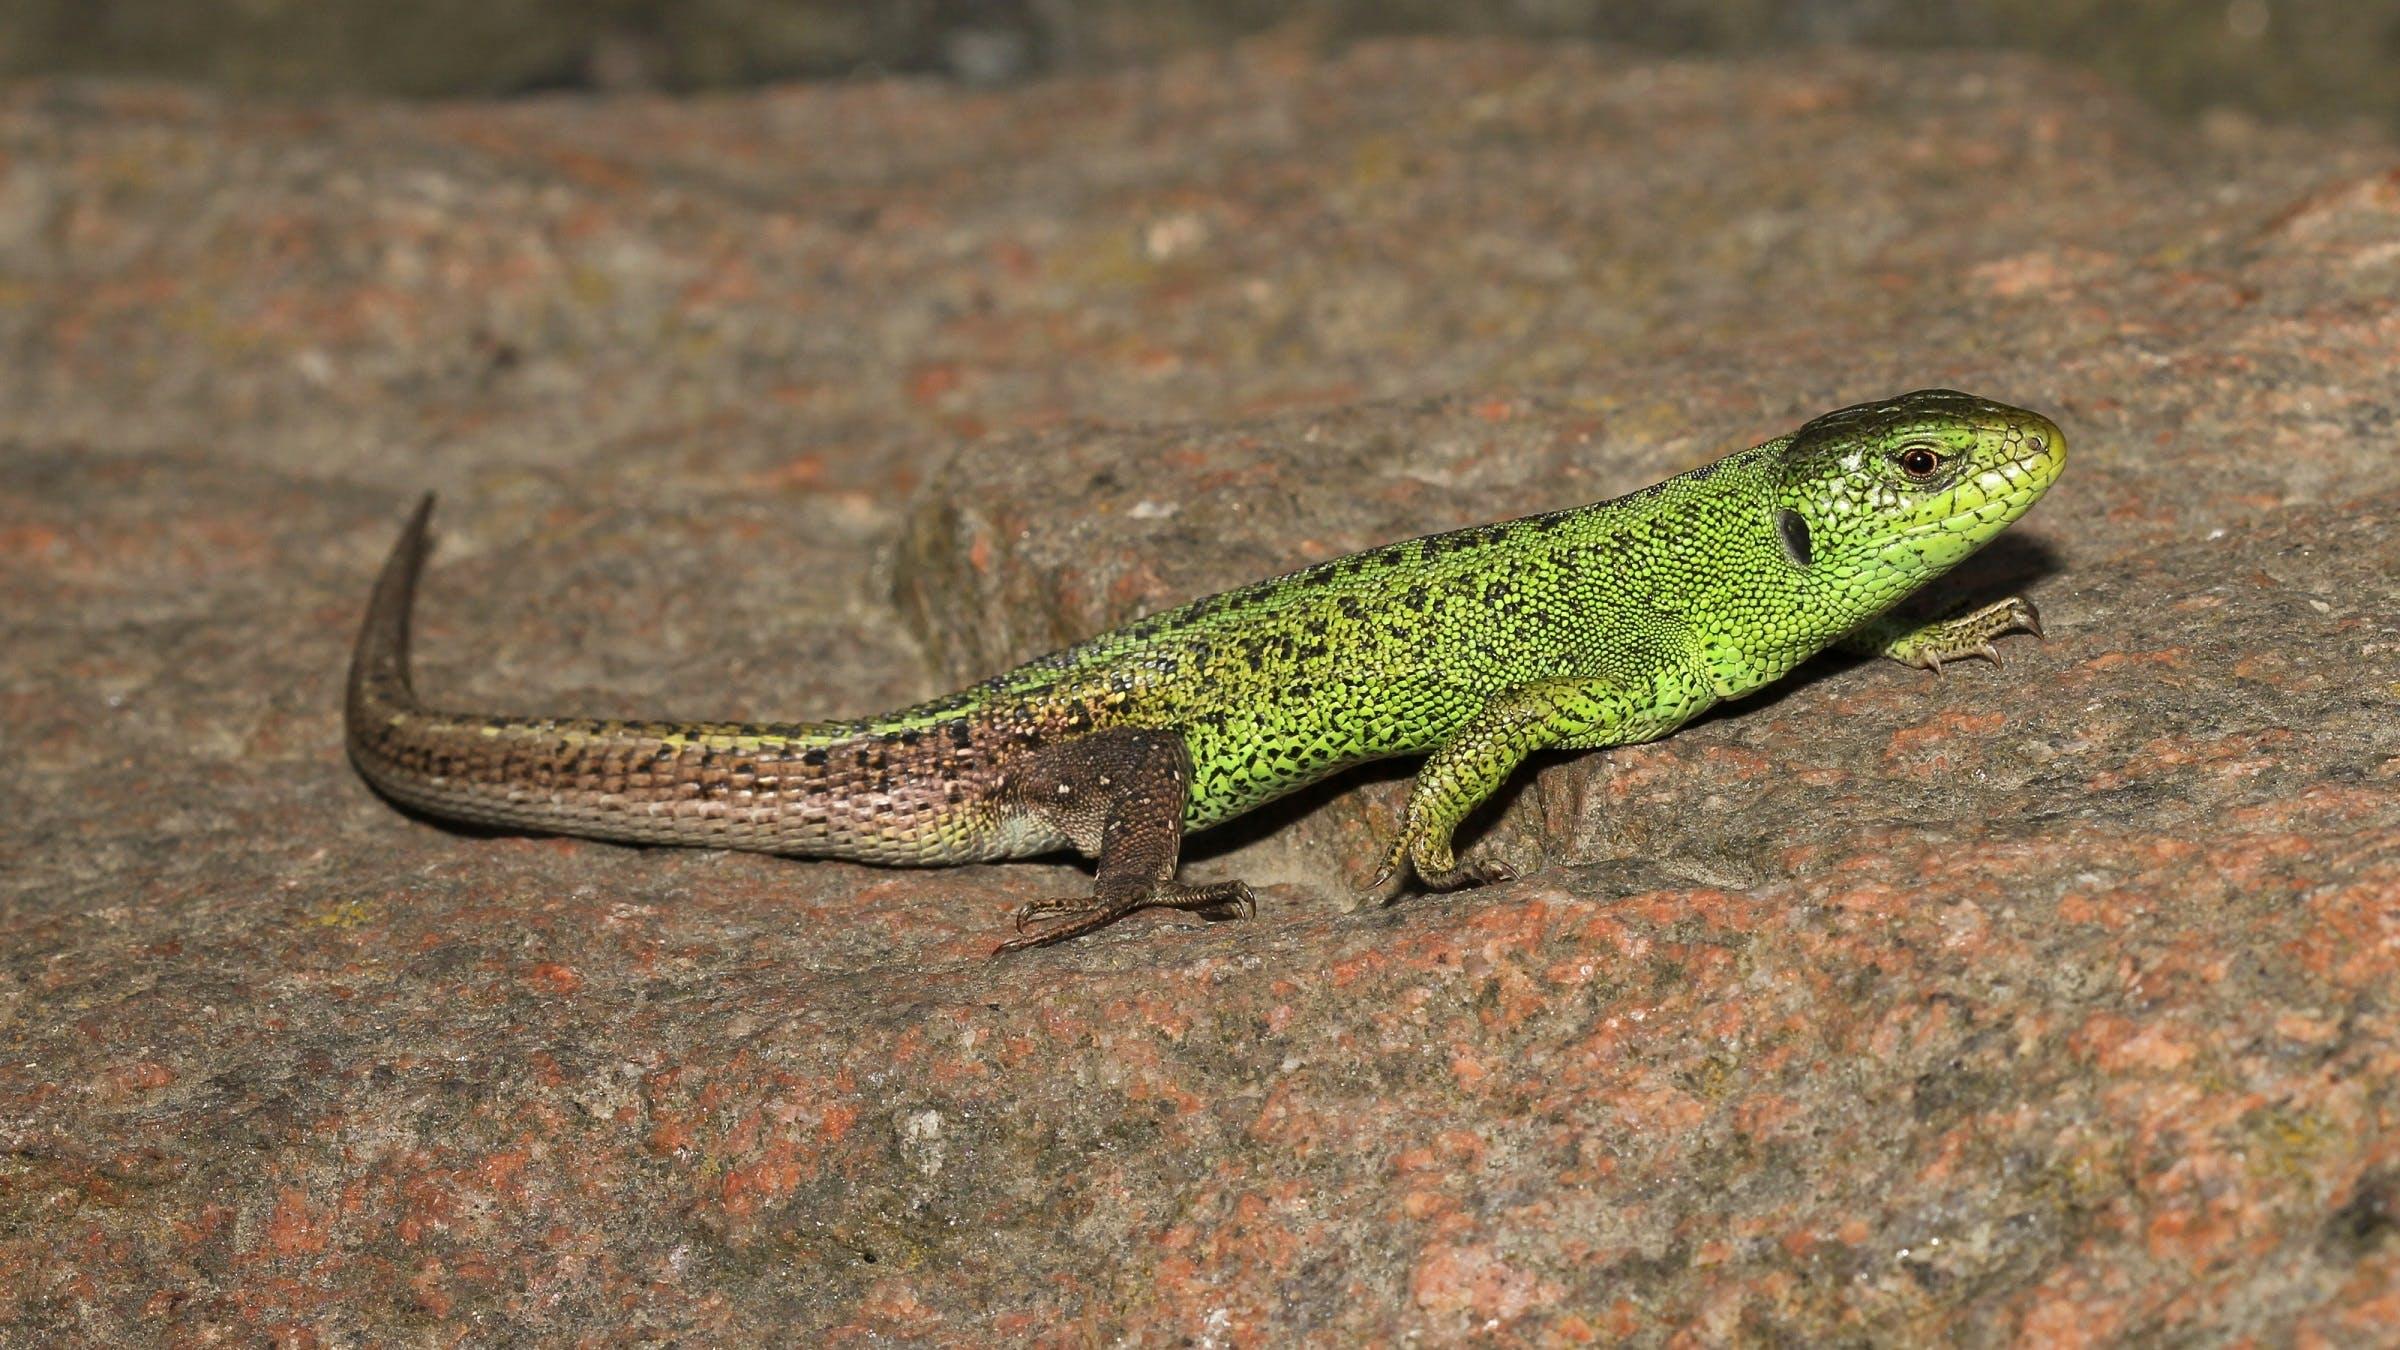 Free stock photo of animal, close up, lacerta agilis, looking